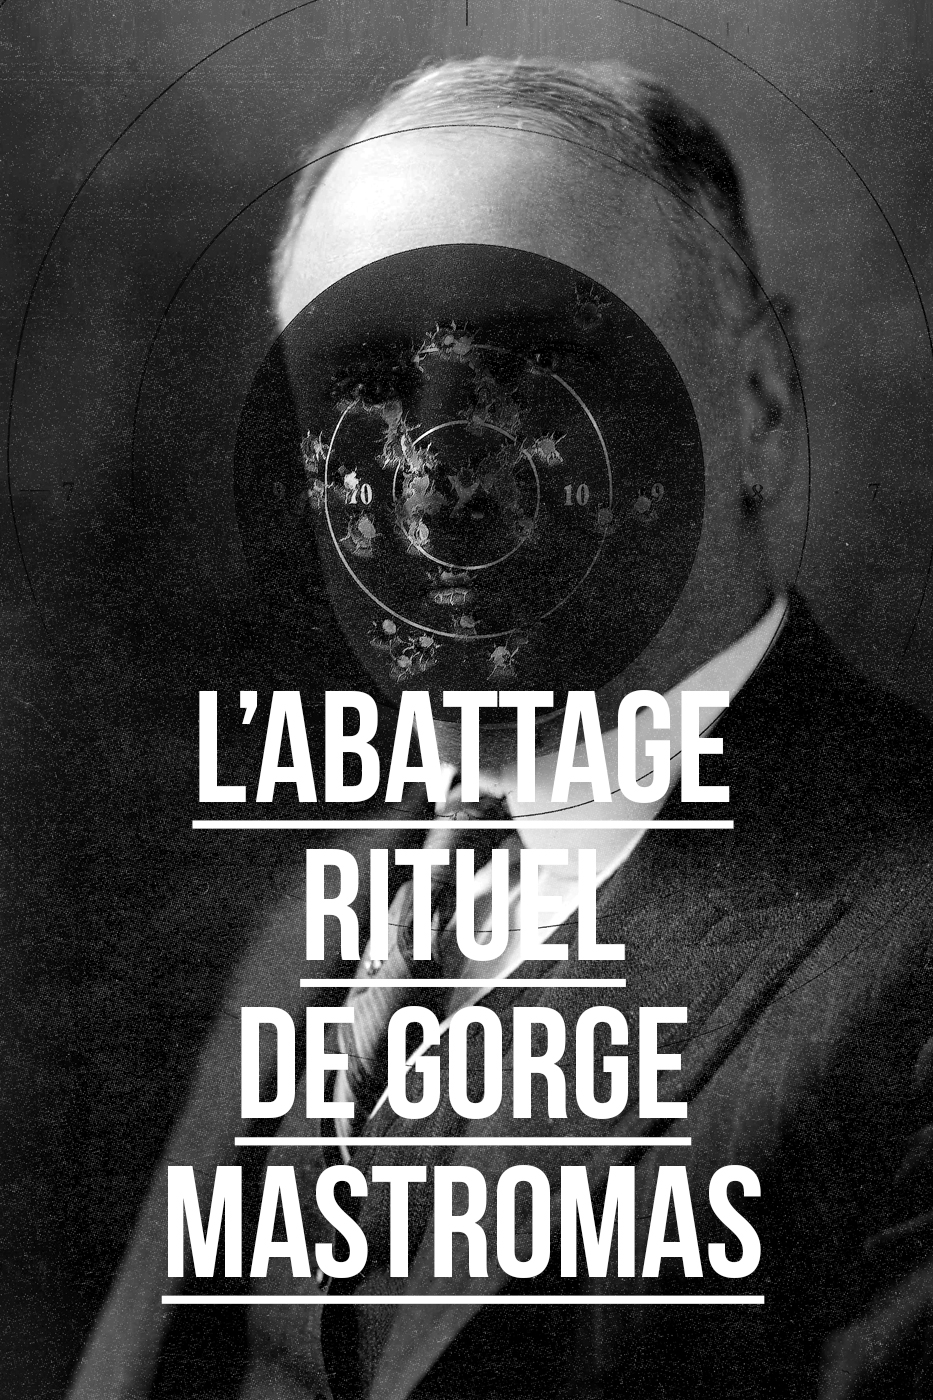 L'Abattage rituel de Gorge Mastromas